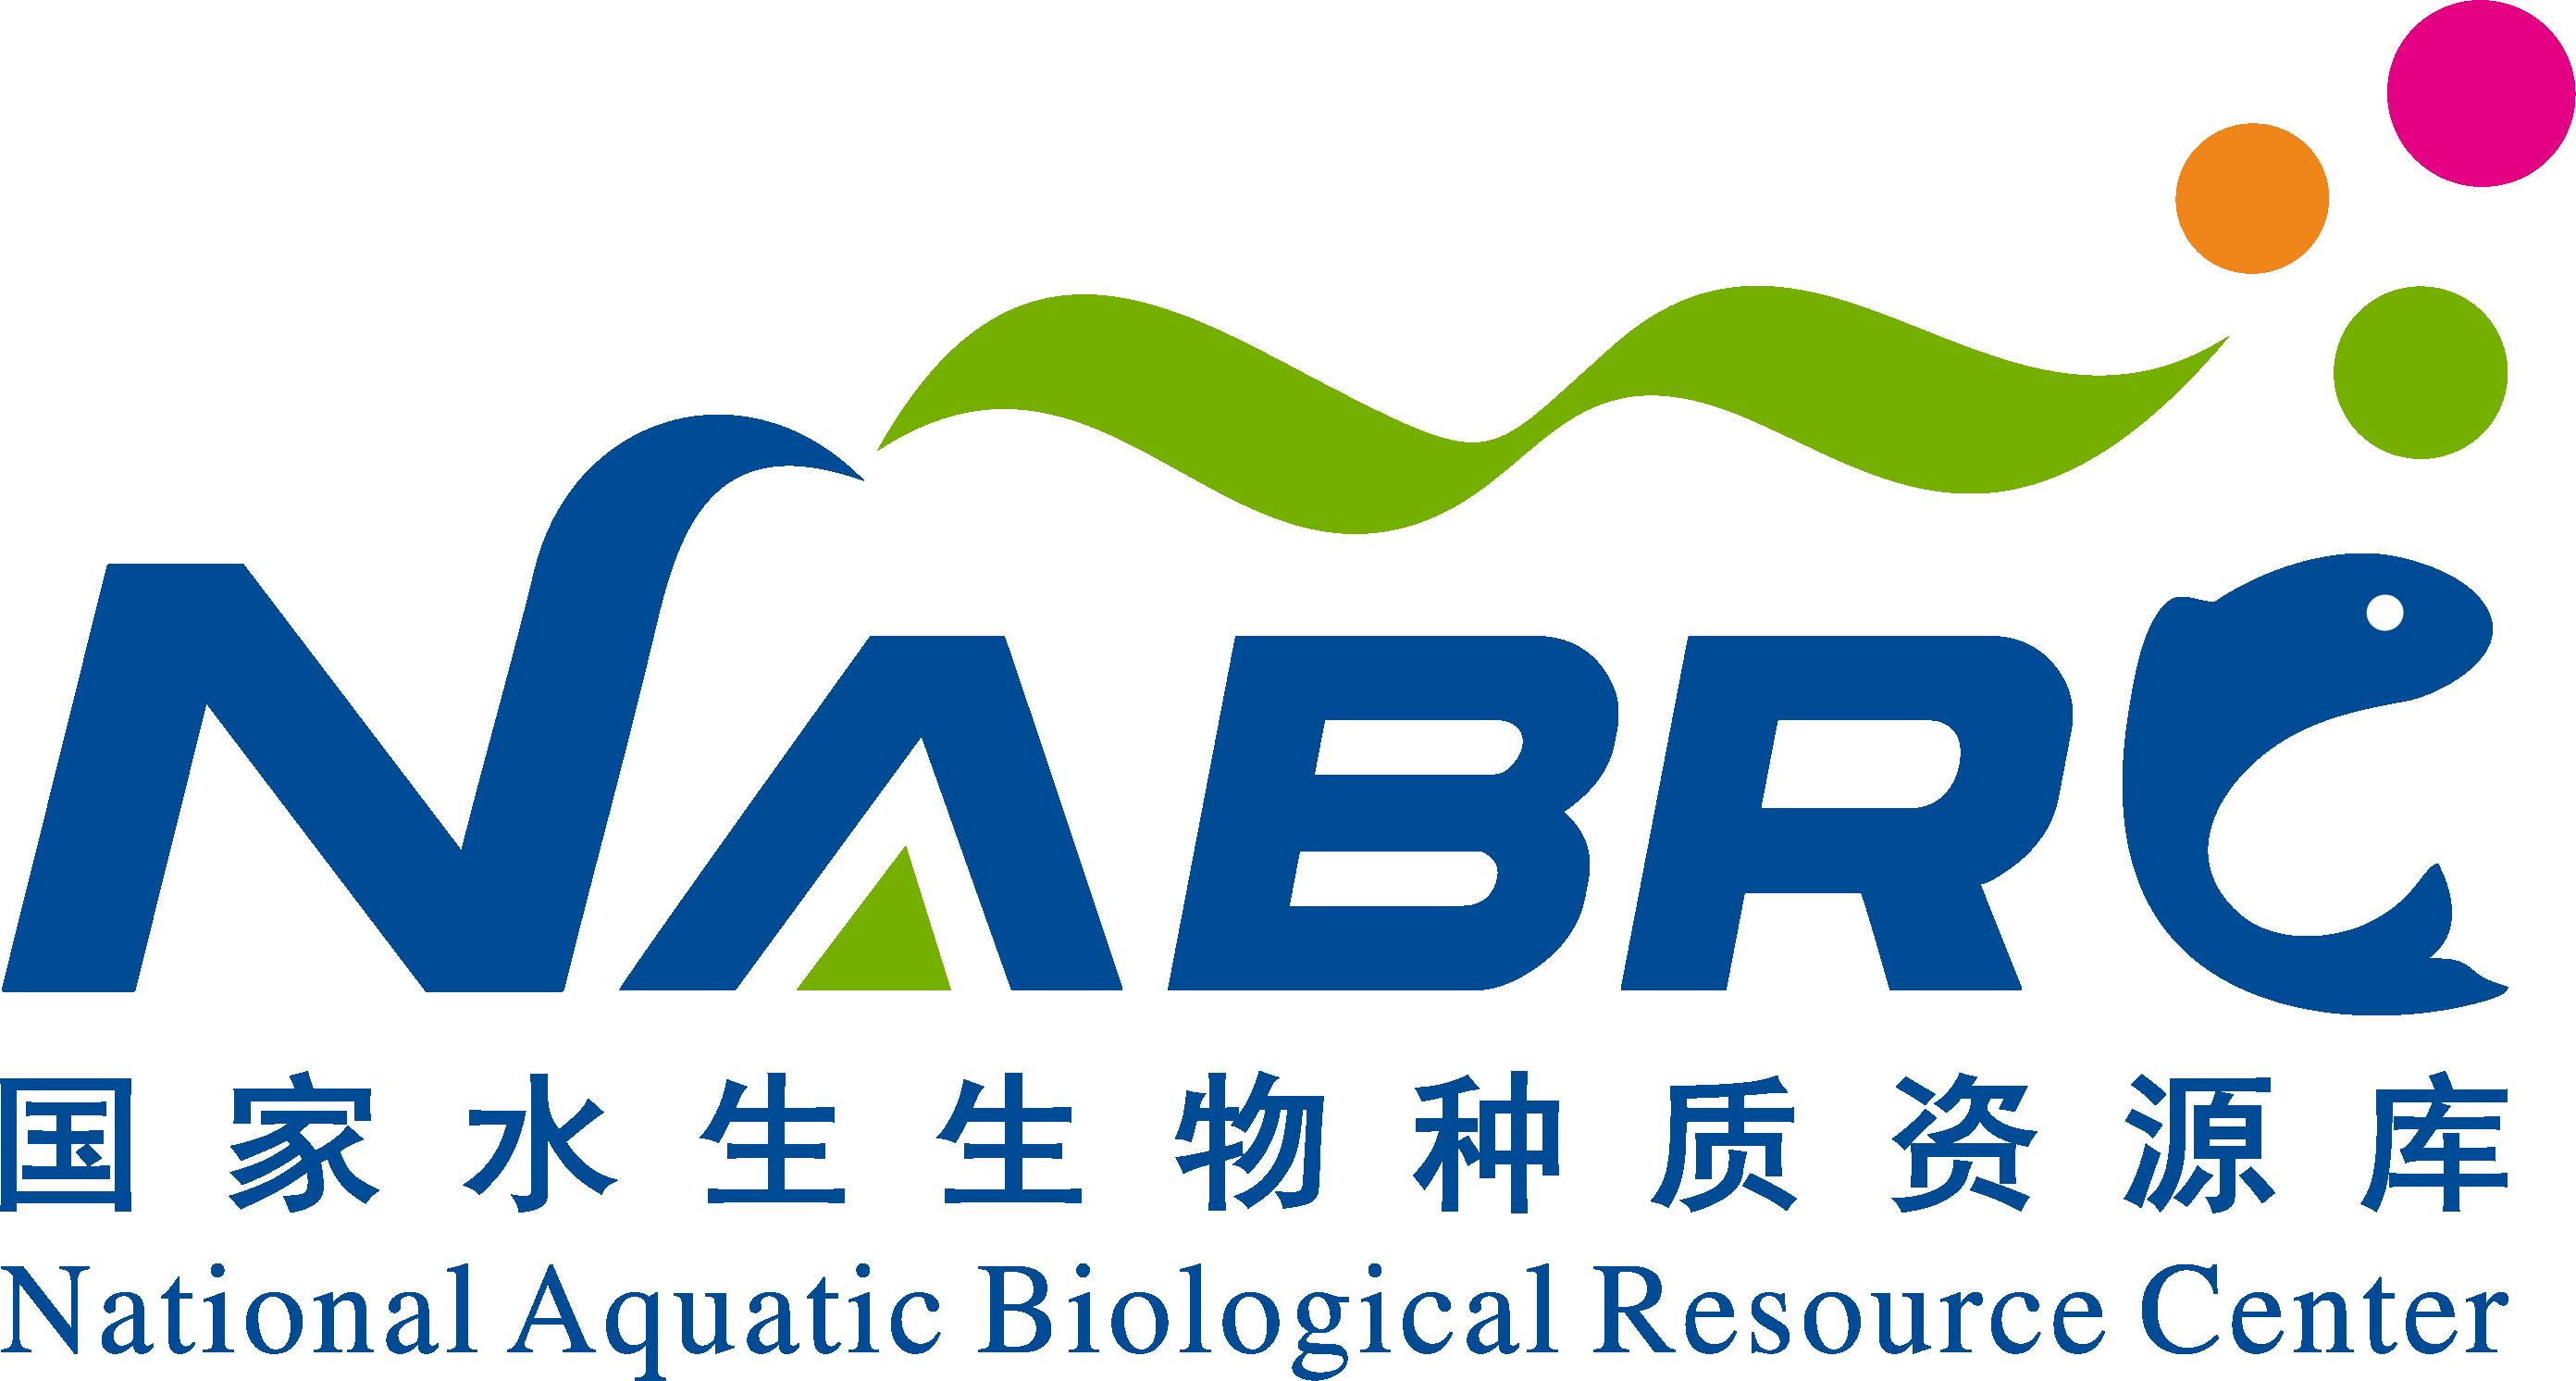 National Aquatic Biological Resource Center